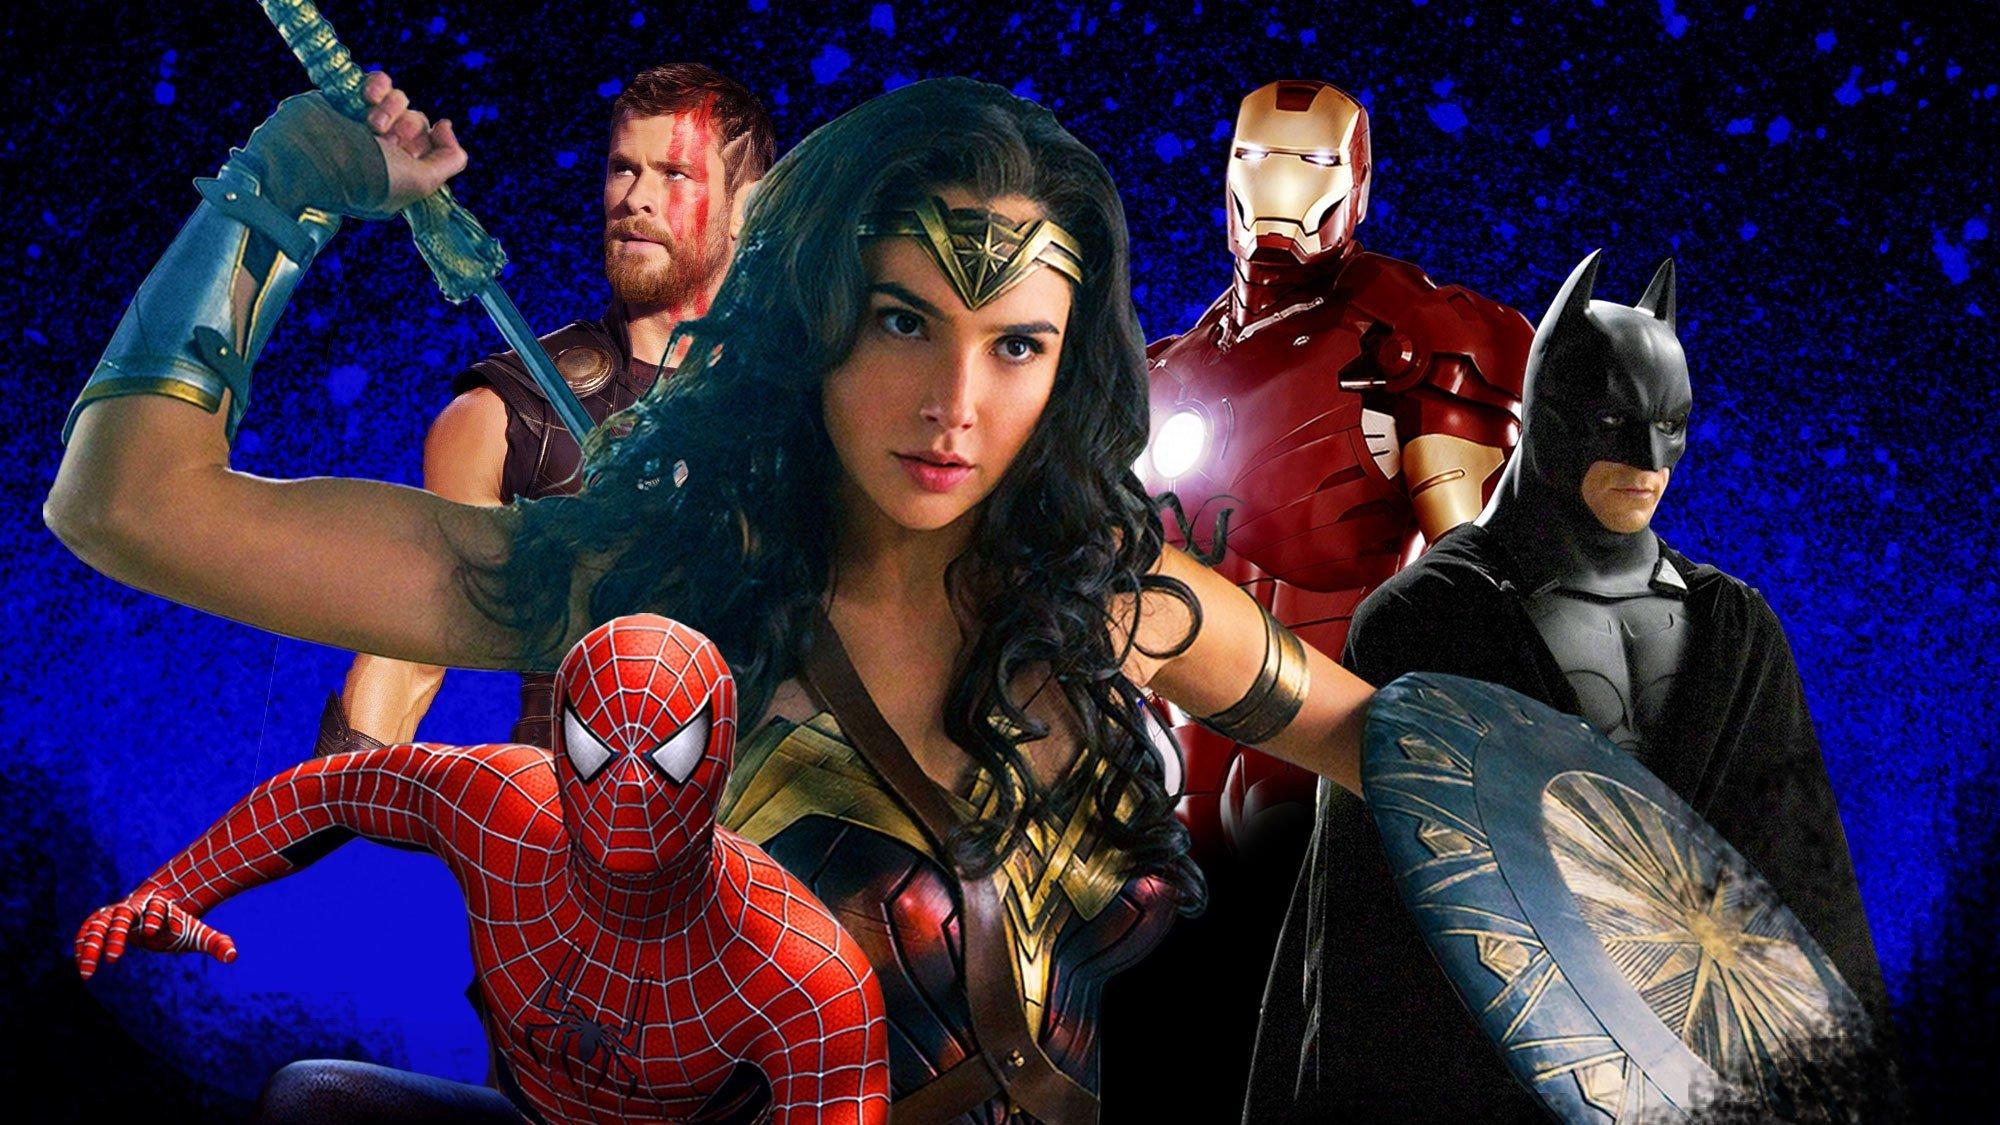 Our definitive list of the 30 best superhero movies https://t.co/duhckA5sTR https://t.co/FWbbe5wxgw